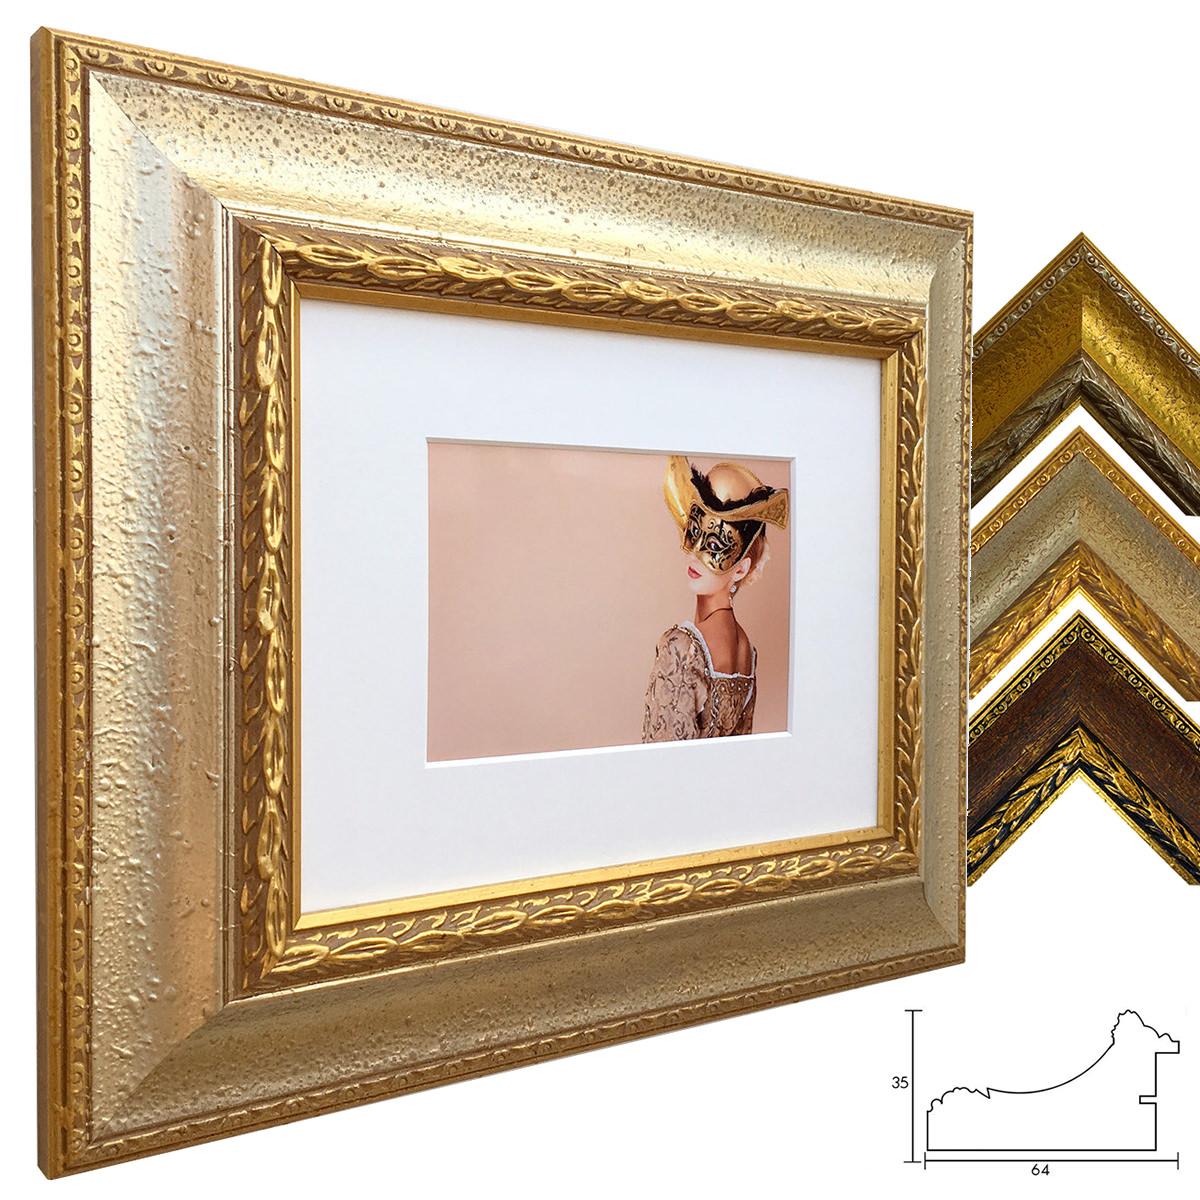 Holz Bilderrahmen Profil 31 mit Passepartout